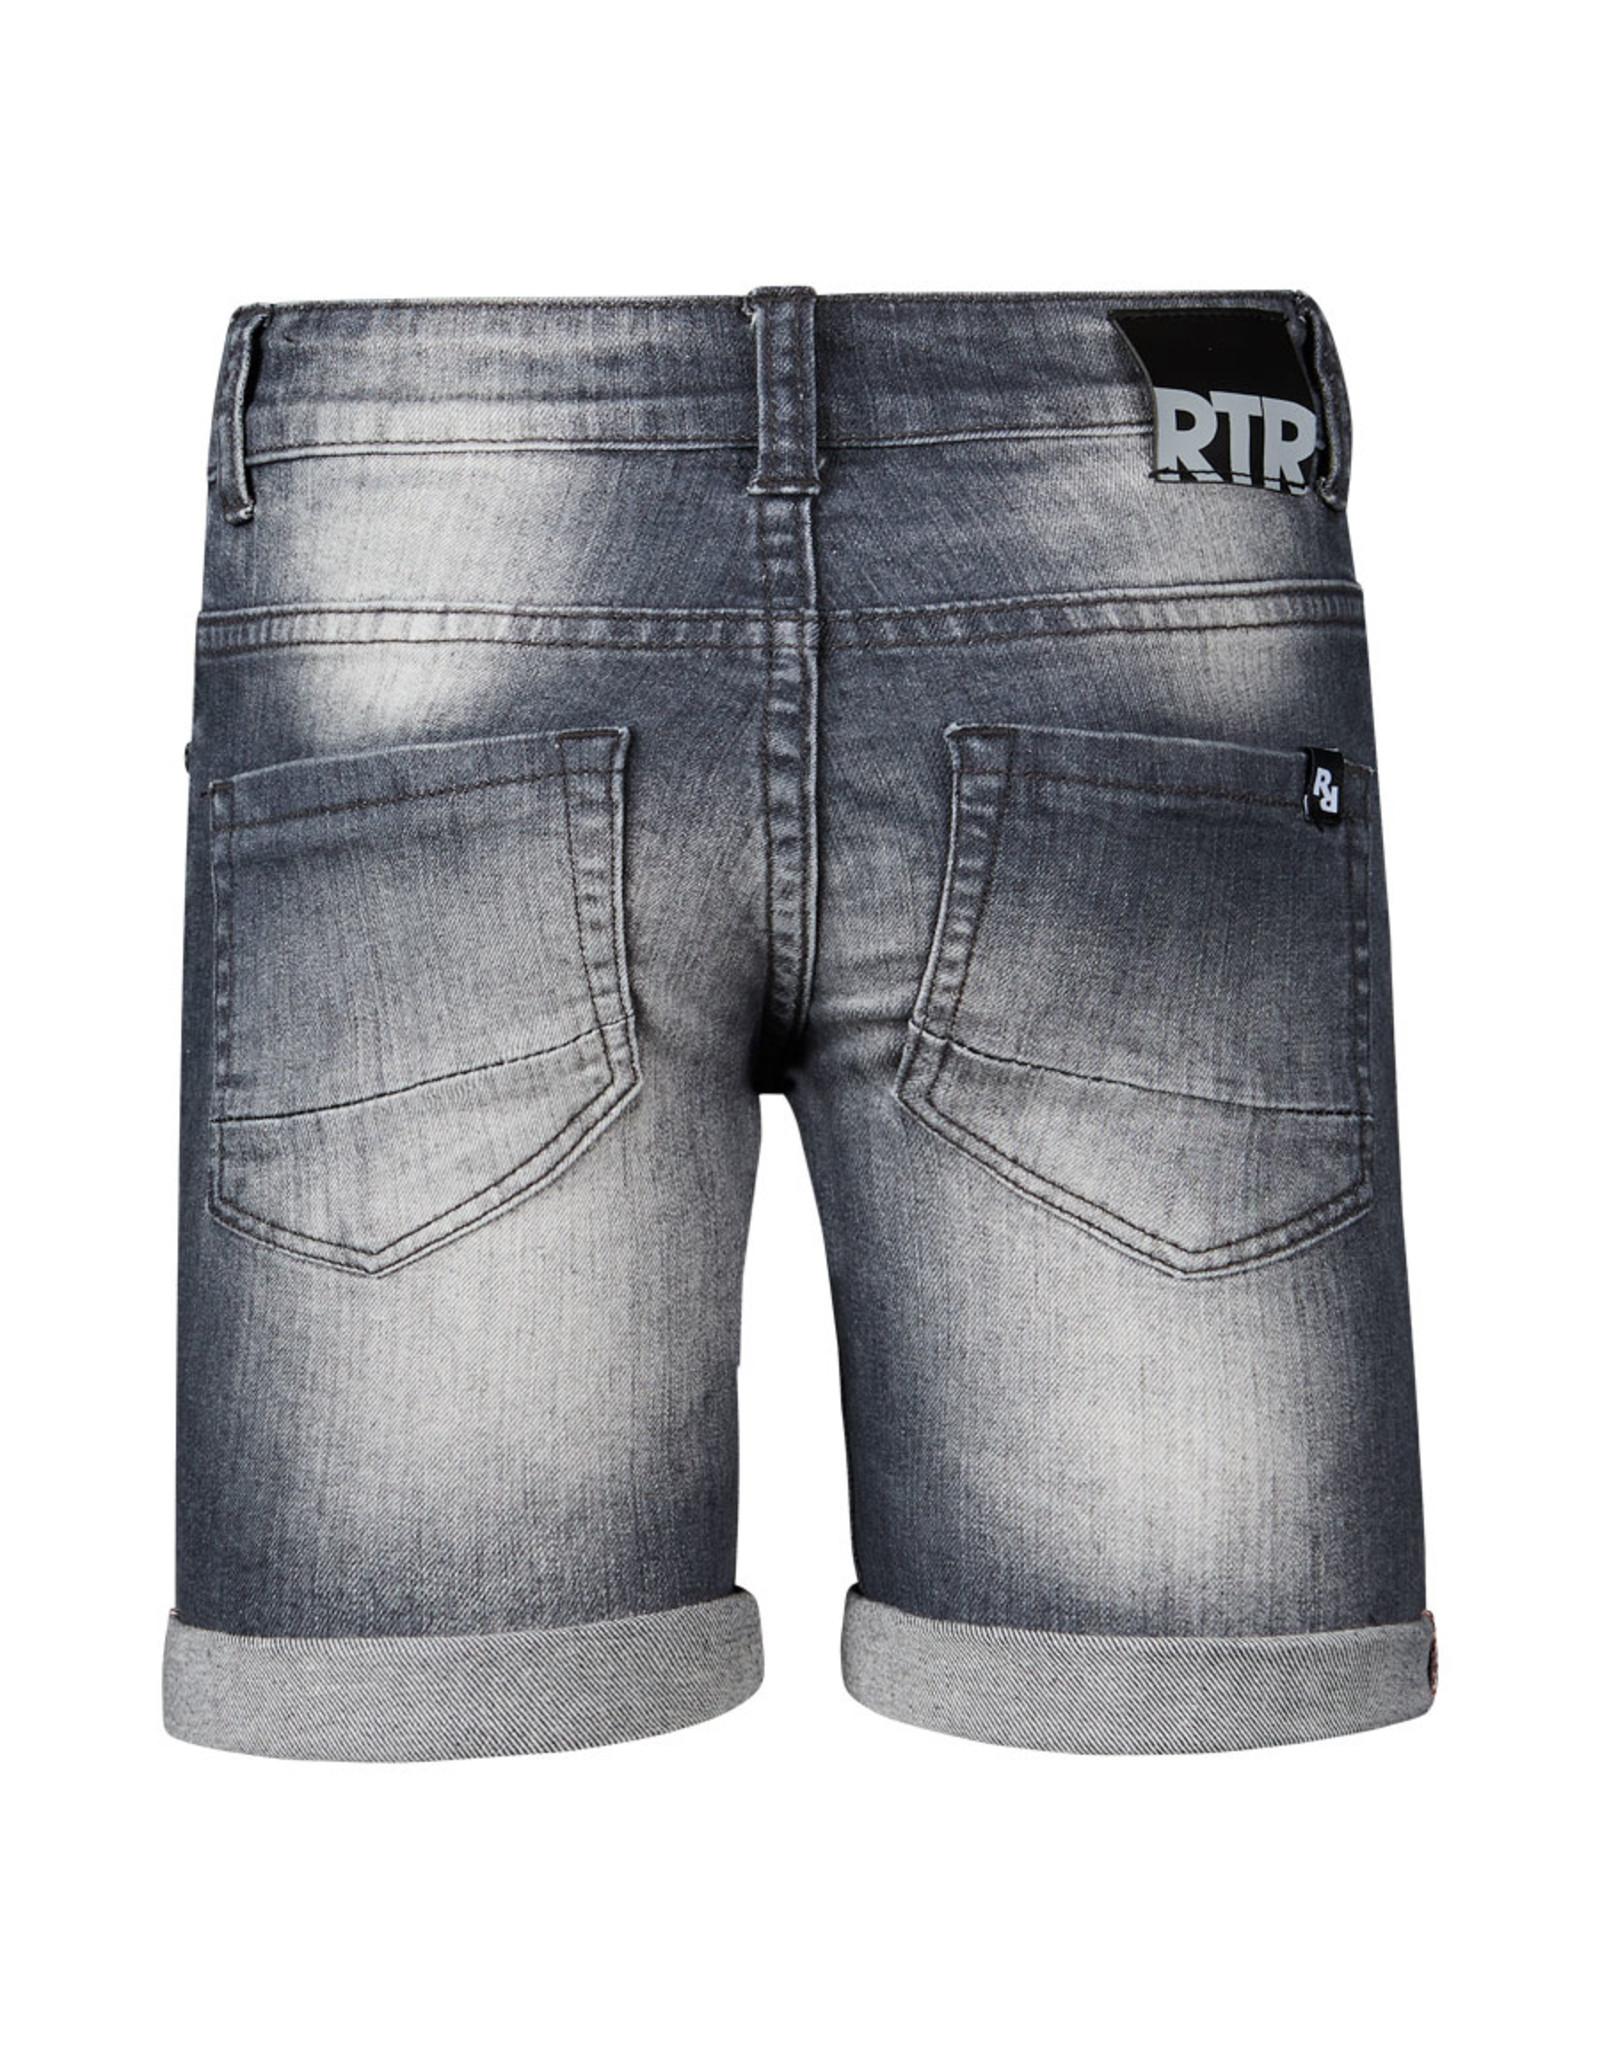 Retour Jeans Short Stephen Medium Grey Denim